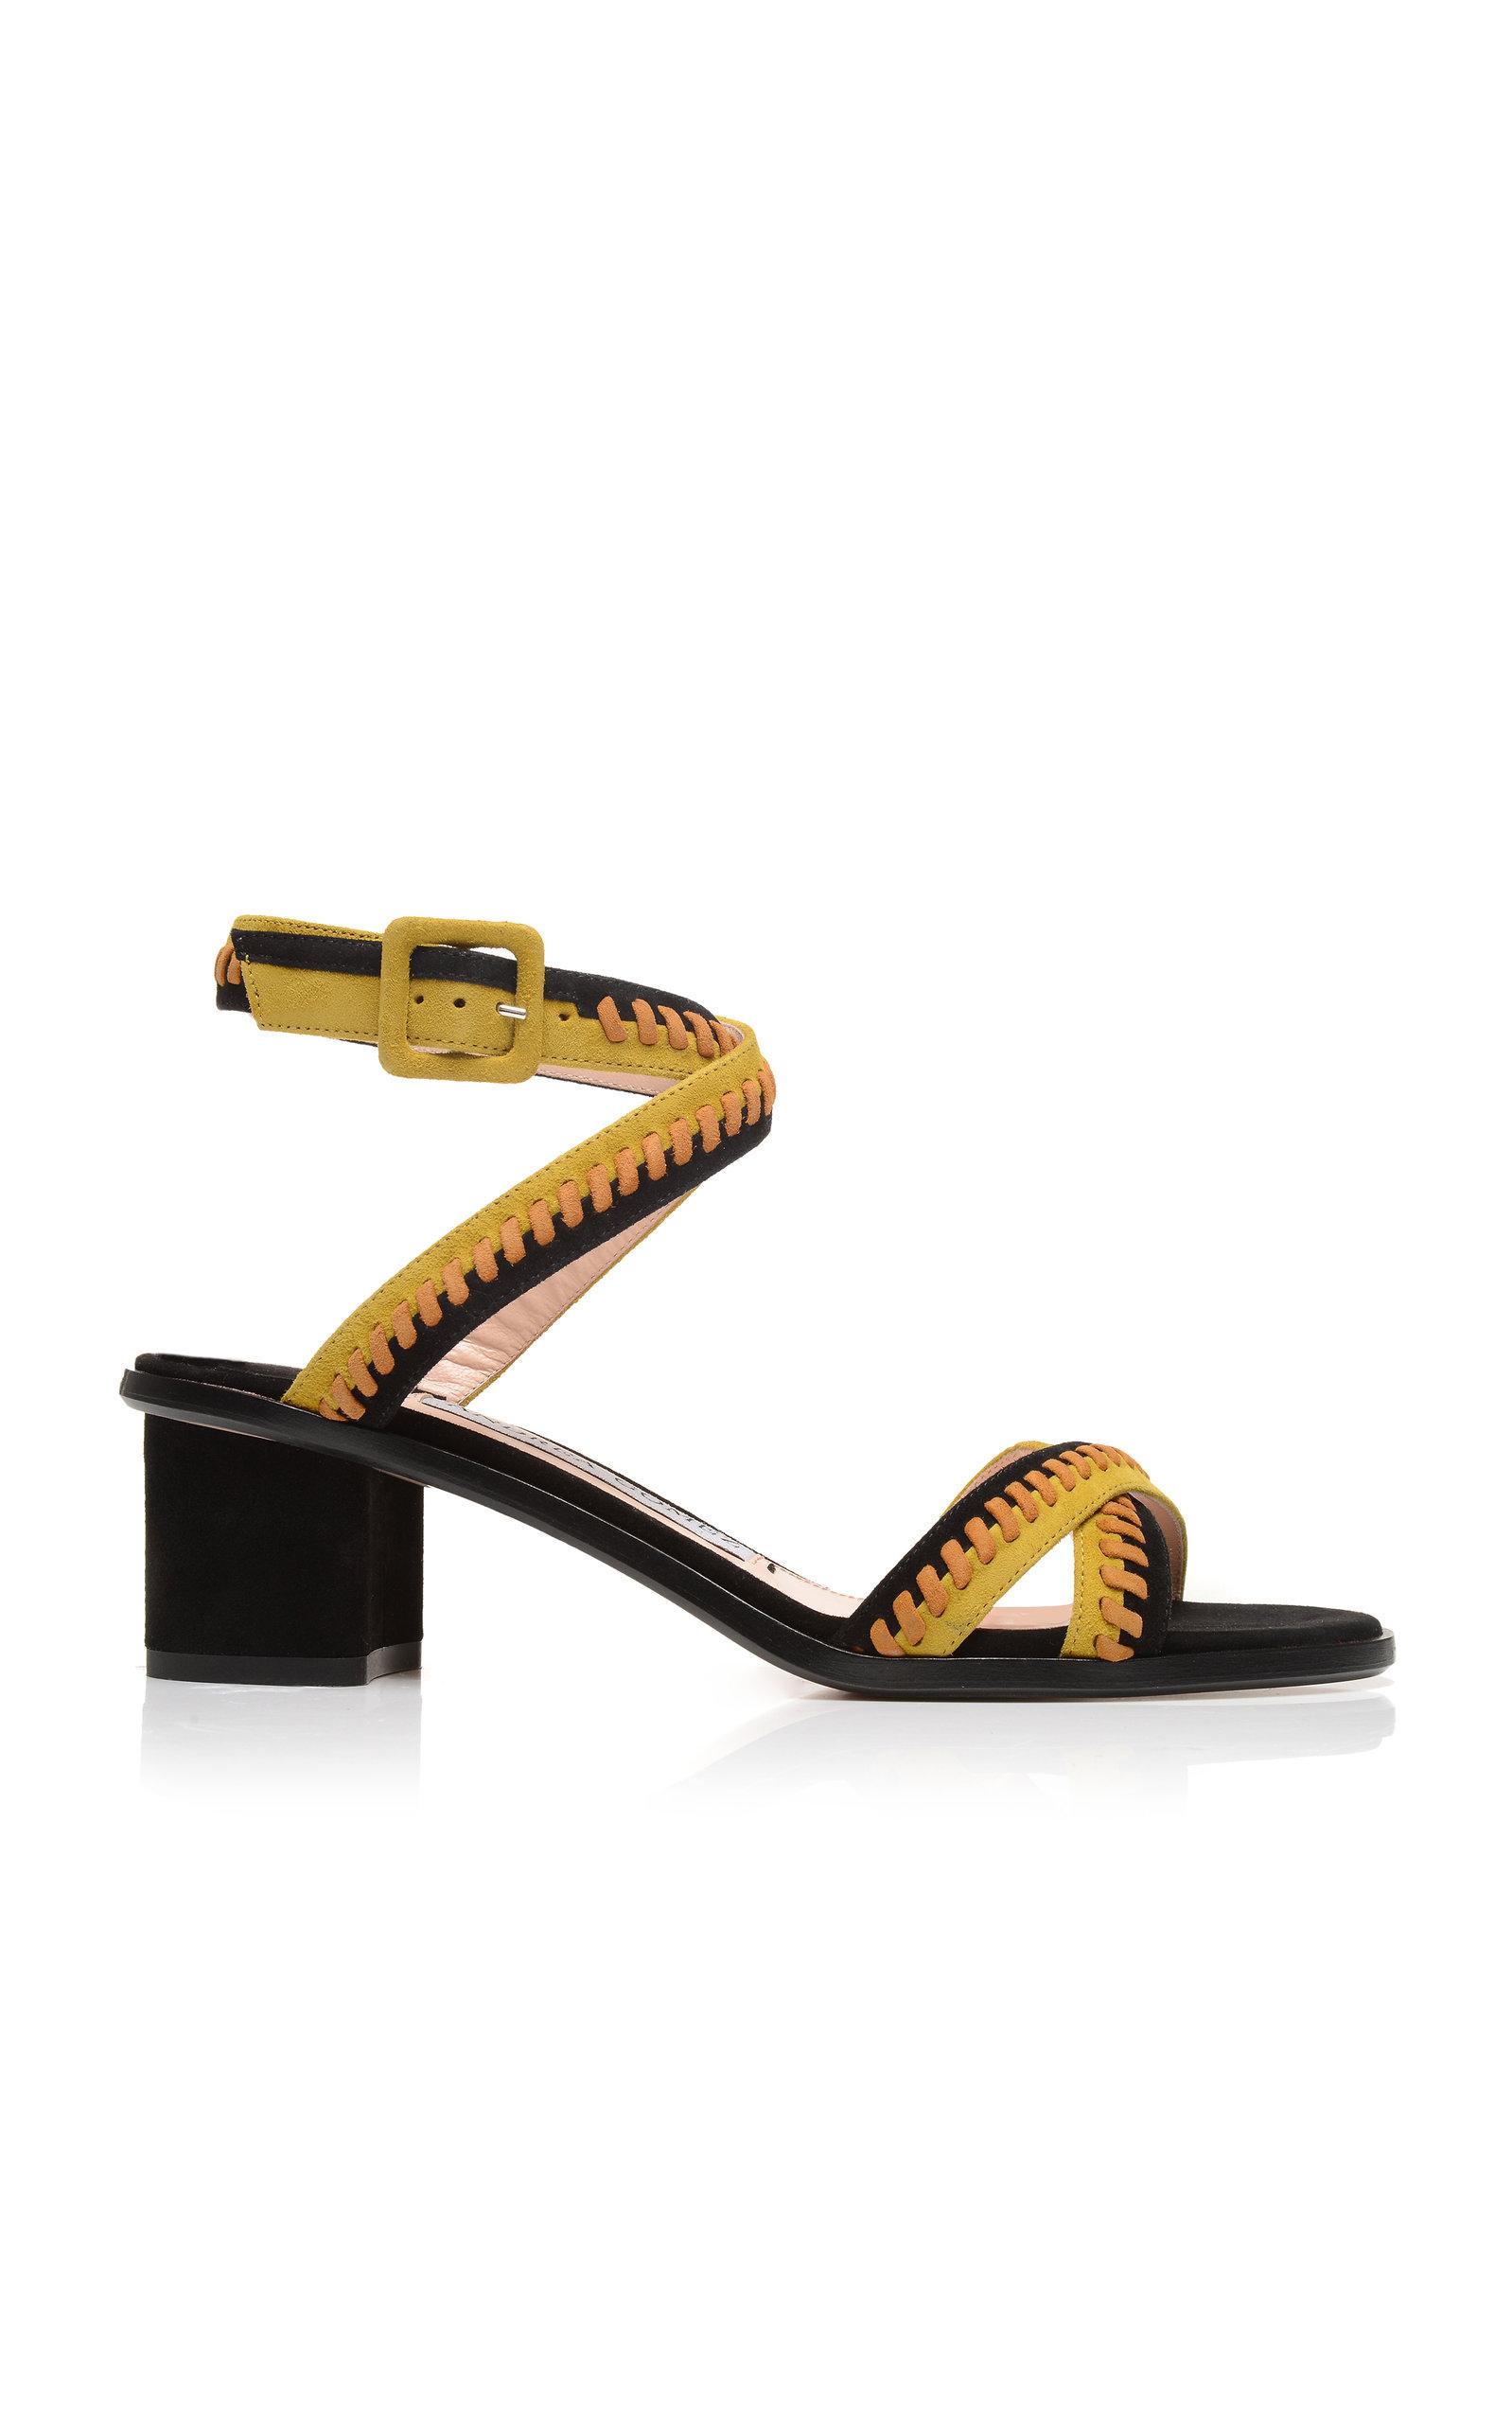 ANDREA GOMEZ Bea Block Sandal in Yellow